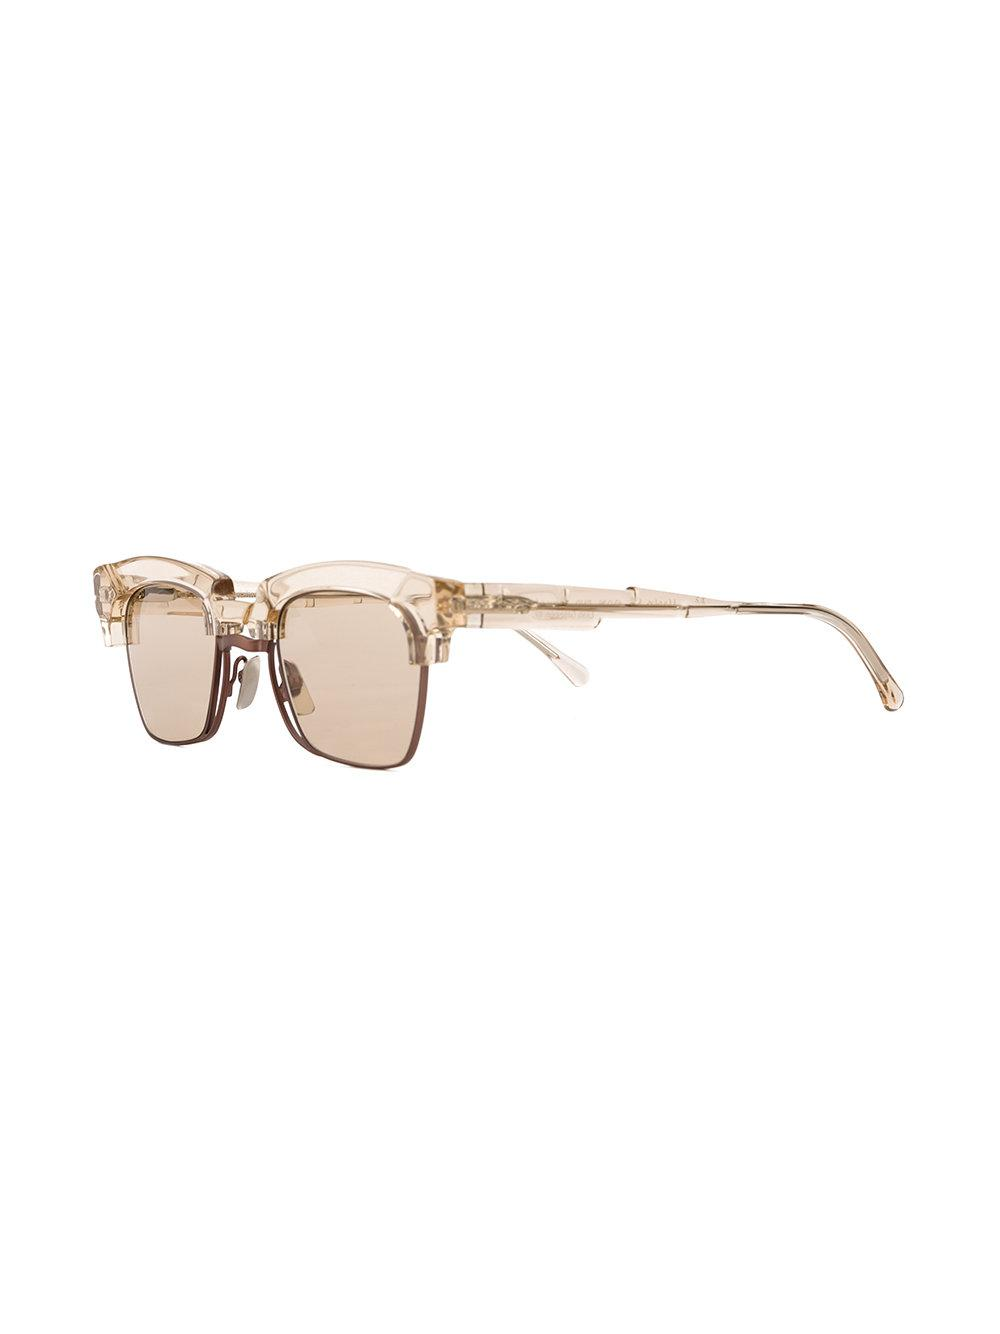 Kuboraum Square Framed Sunglasses in Brown